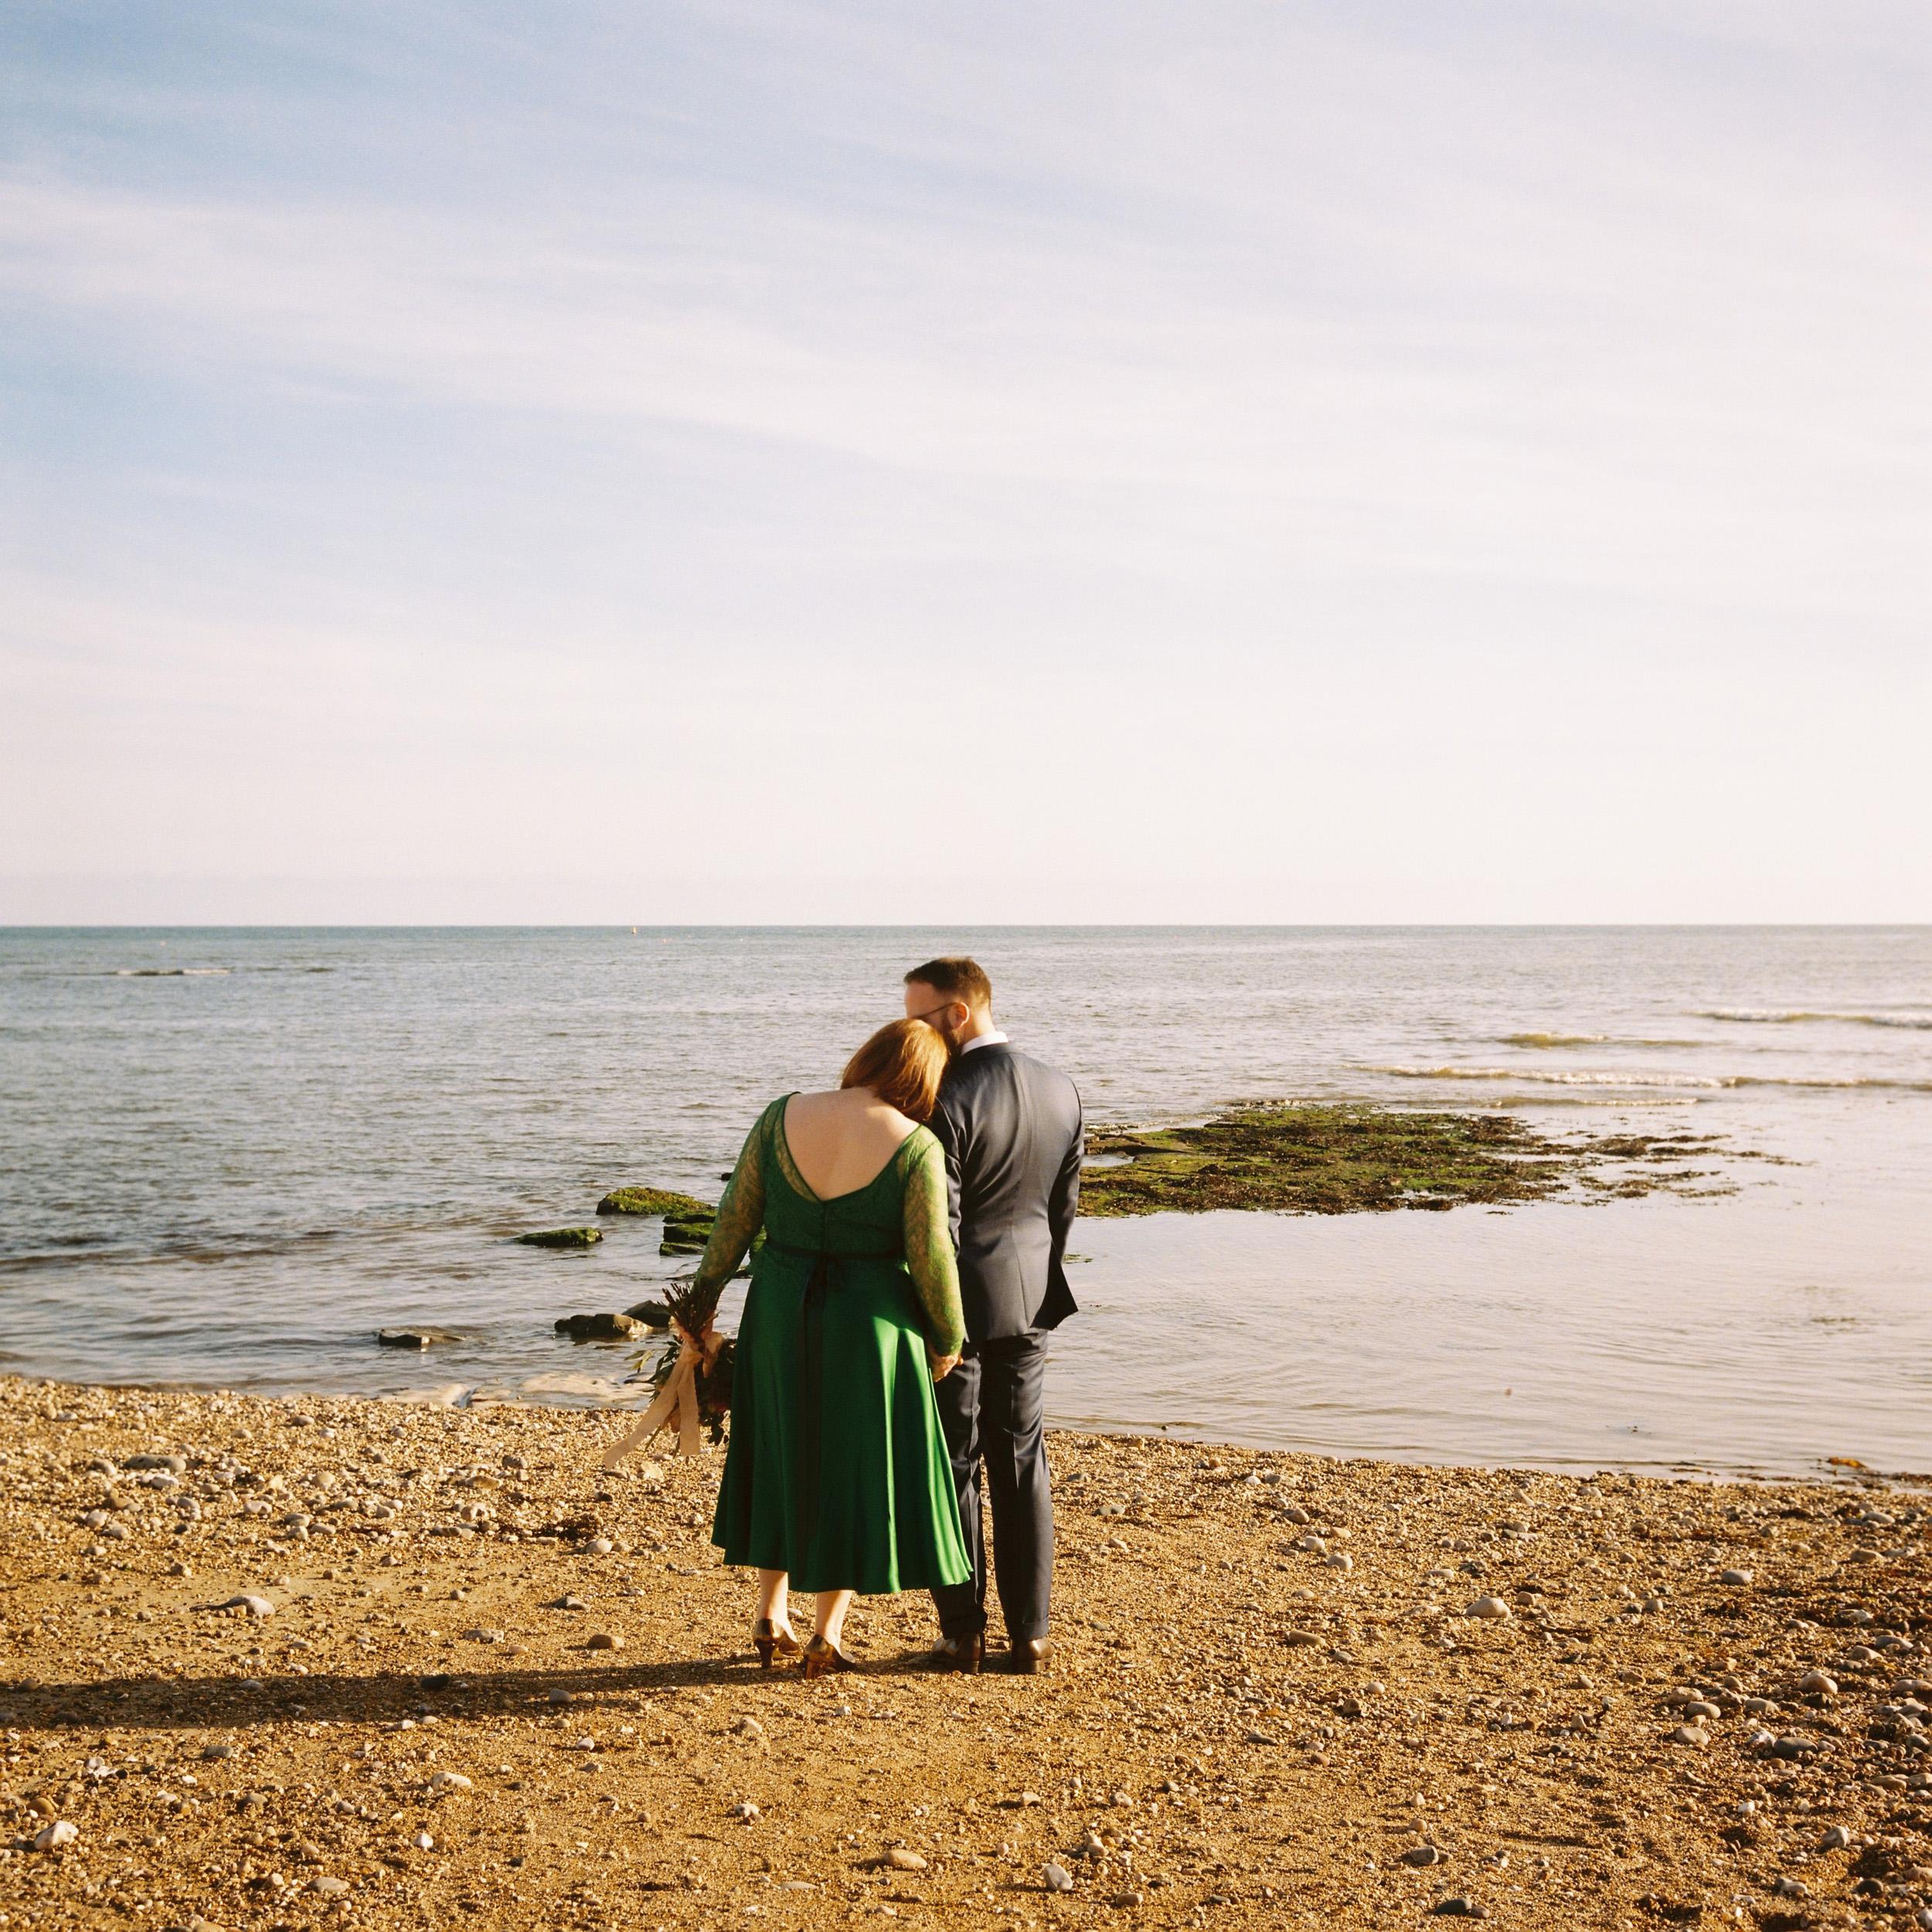 Lucy-Bespoke-Green-Silk-Lace-Wedding-Dress-Kate-Beaumont-Sheffield-4.jpg